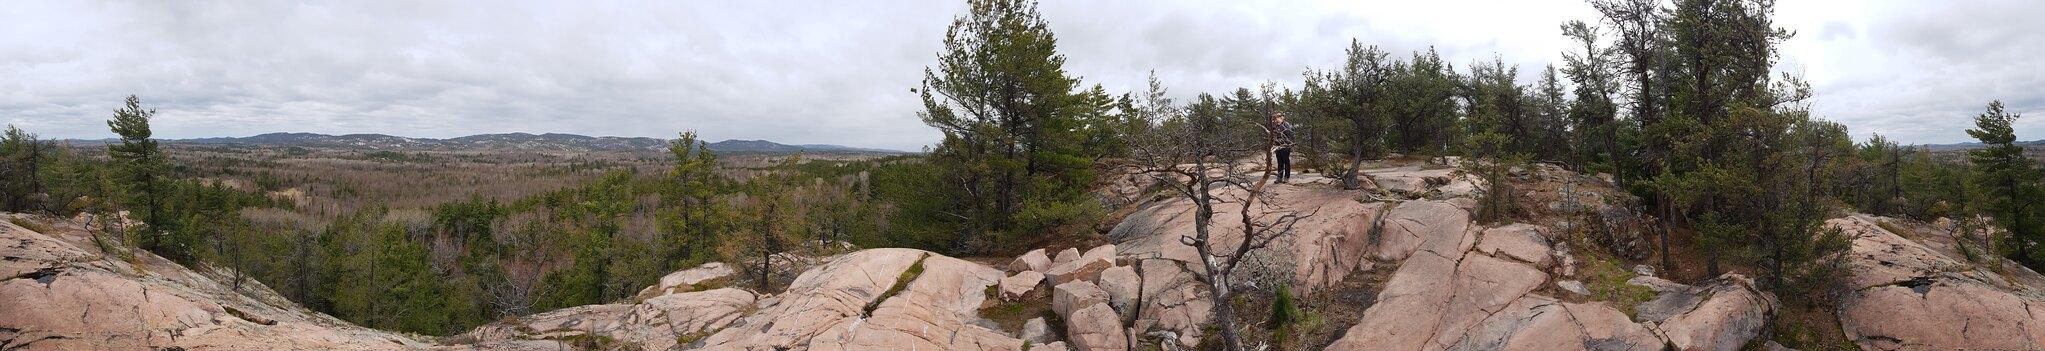 Windy lookout point on Granite Ridge trail in Killarney Provincial Park